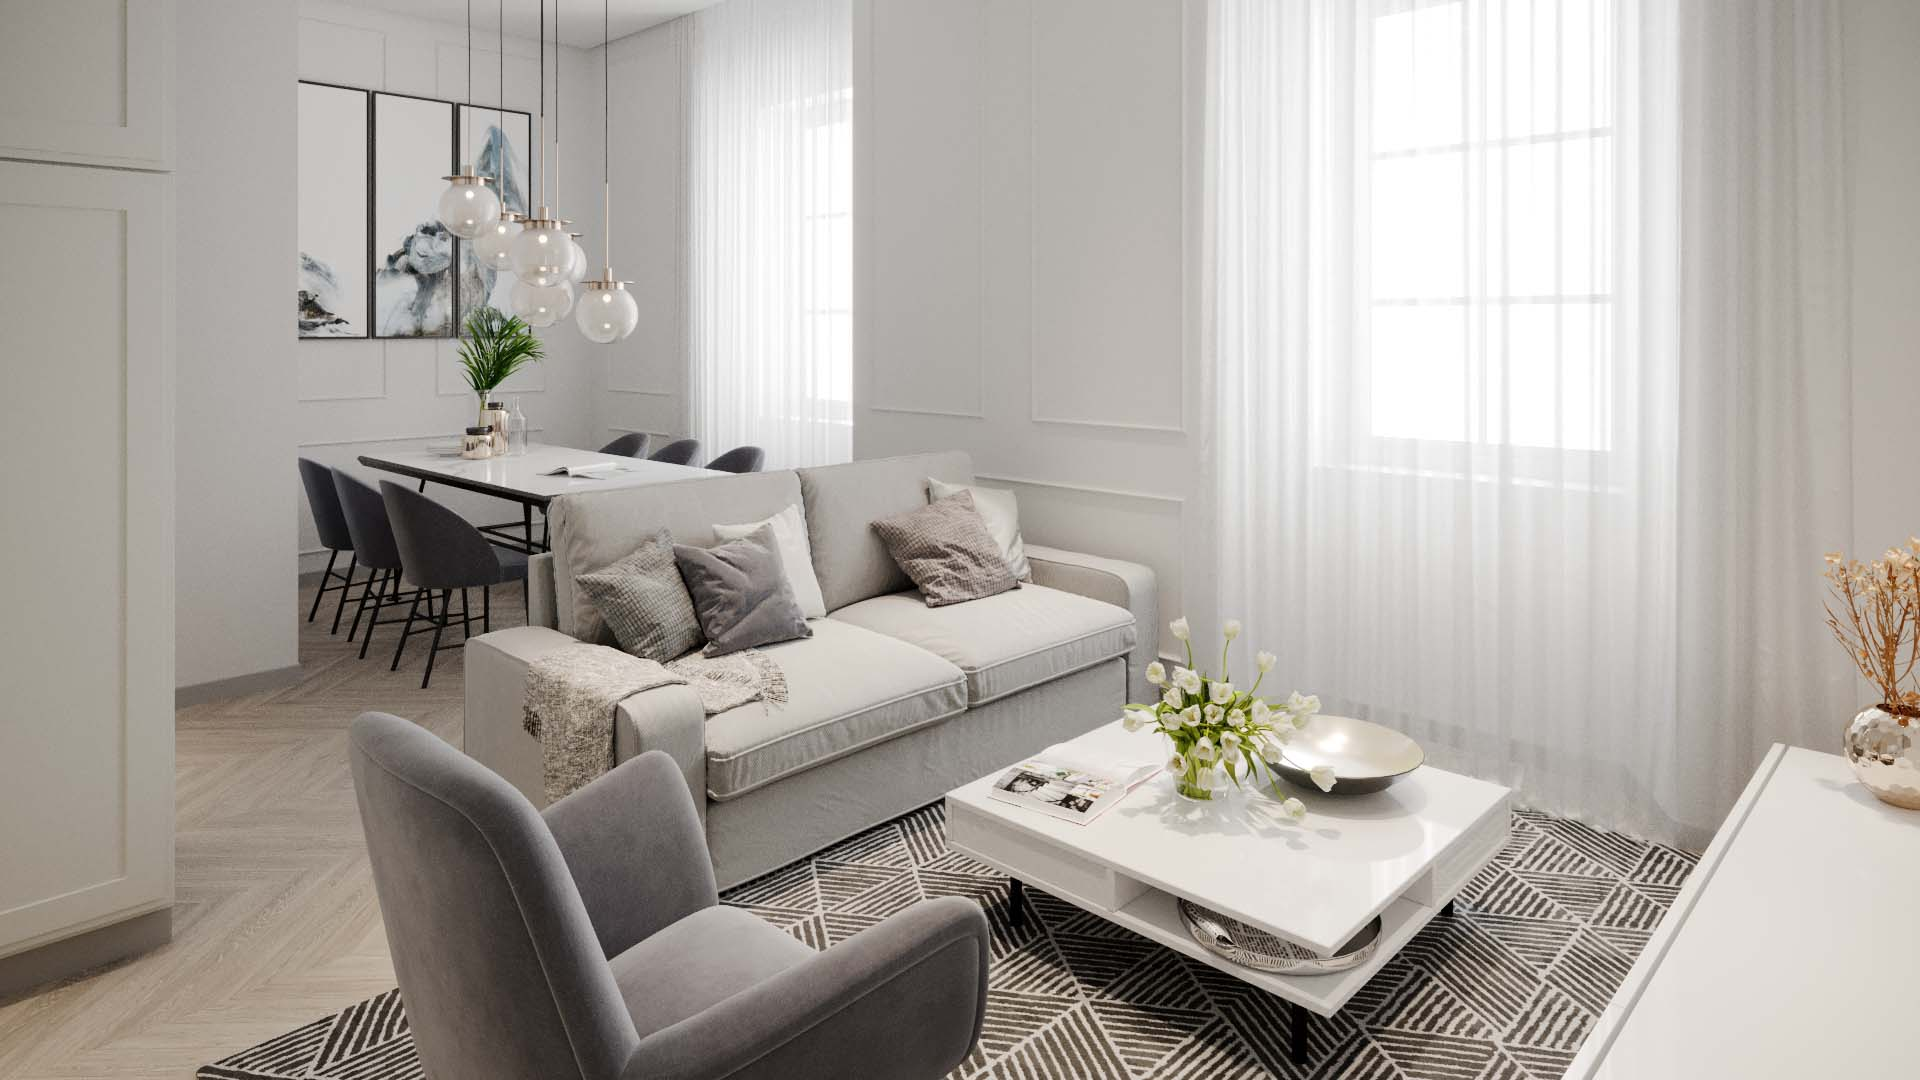 Livinpokestudio_projects_interiordesign